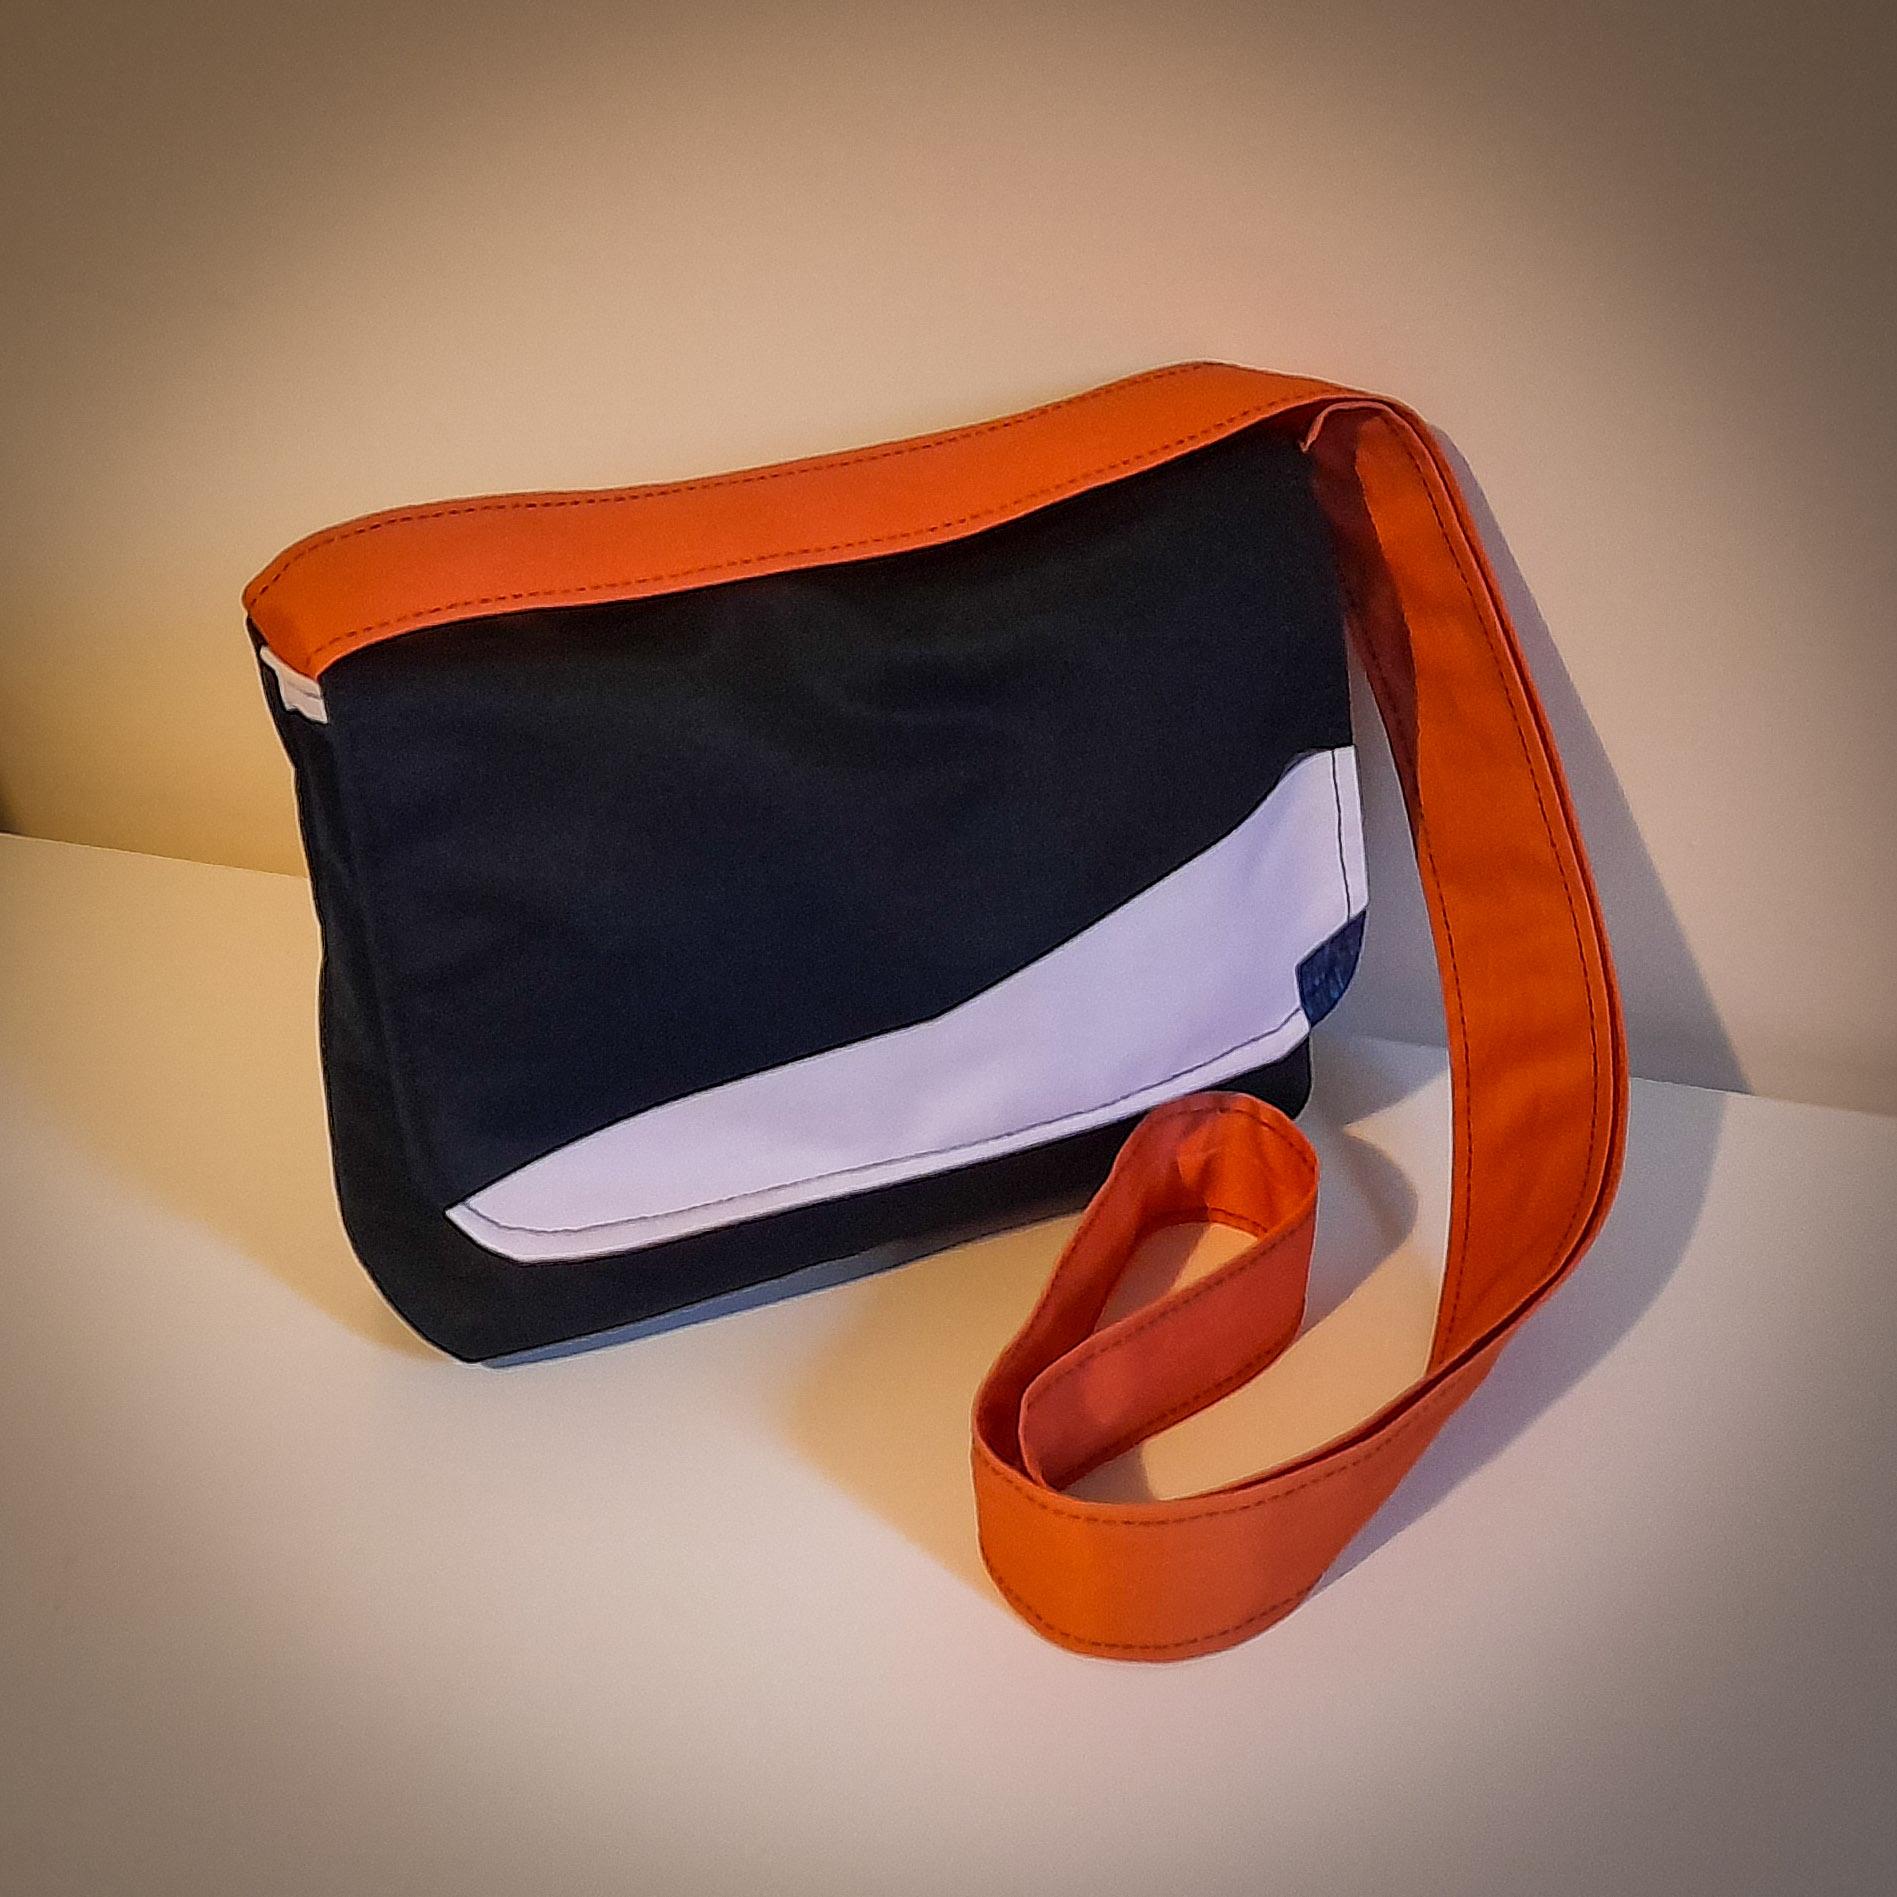 Handmade Fabric Cross Body Handbag, Black & White / Orange